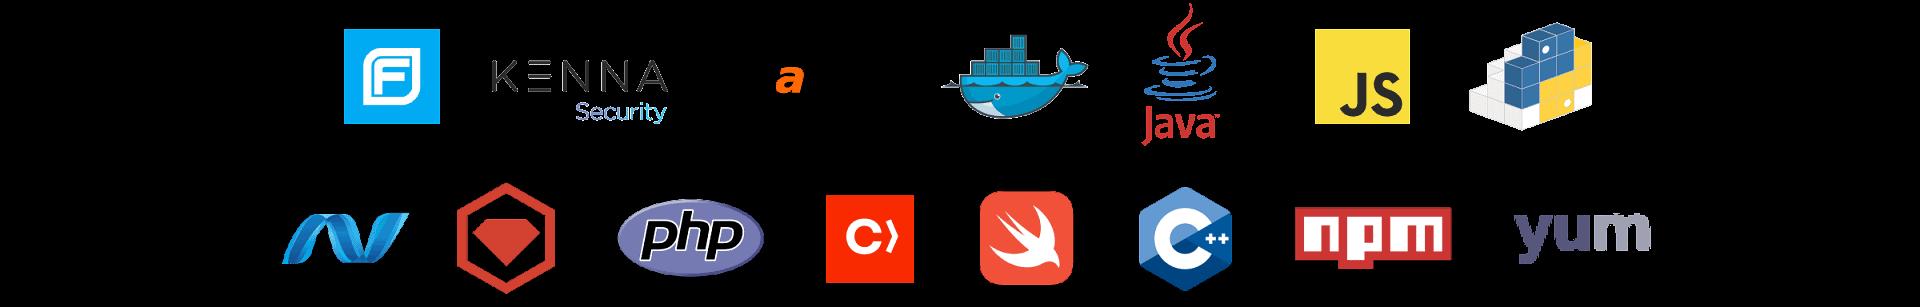 Integrate open source security across your entire SDLC.